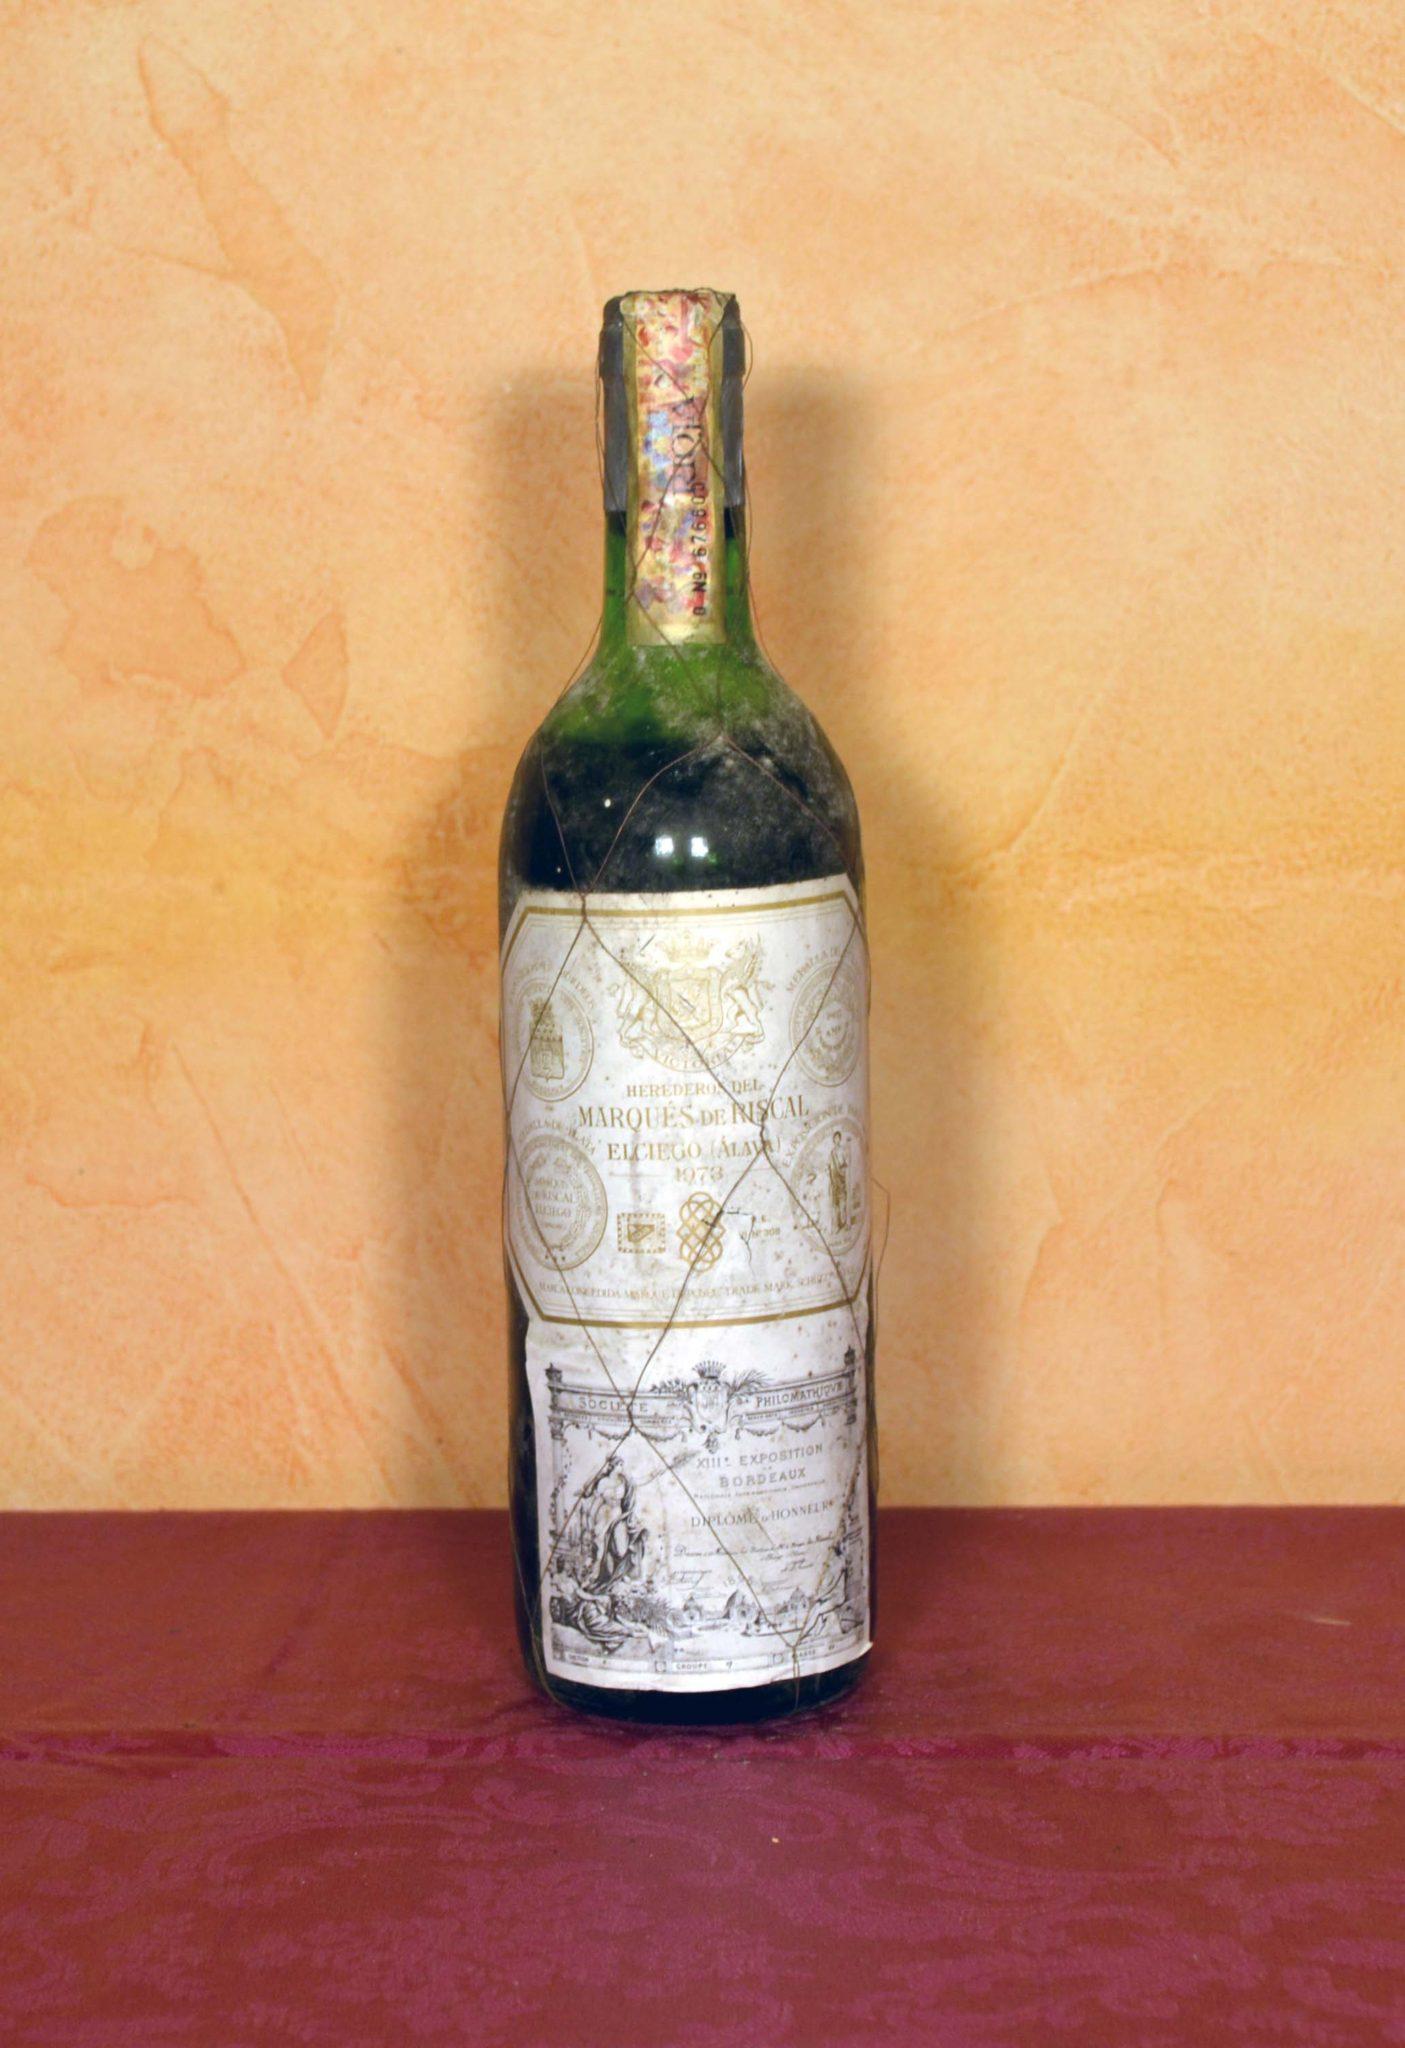 Marques de Riscal 1973 Collector's Wines Tuhistoria.es